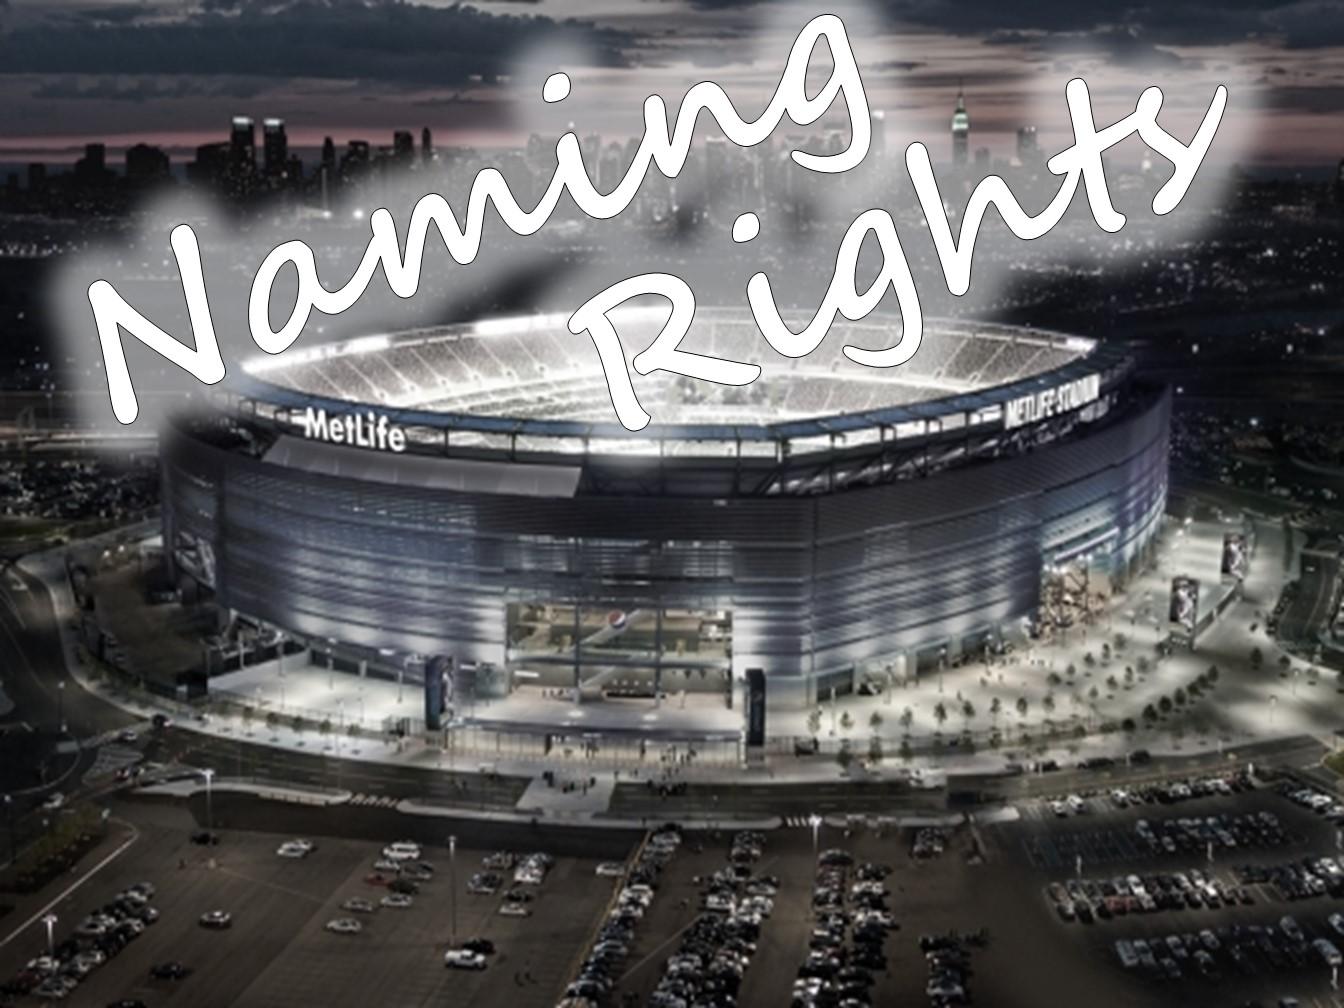 【NFLスタジアム】命名権について!あんな会社やこんな業種も。